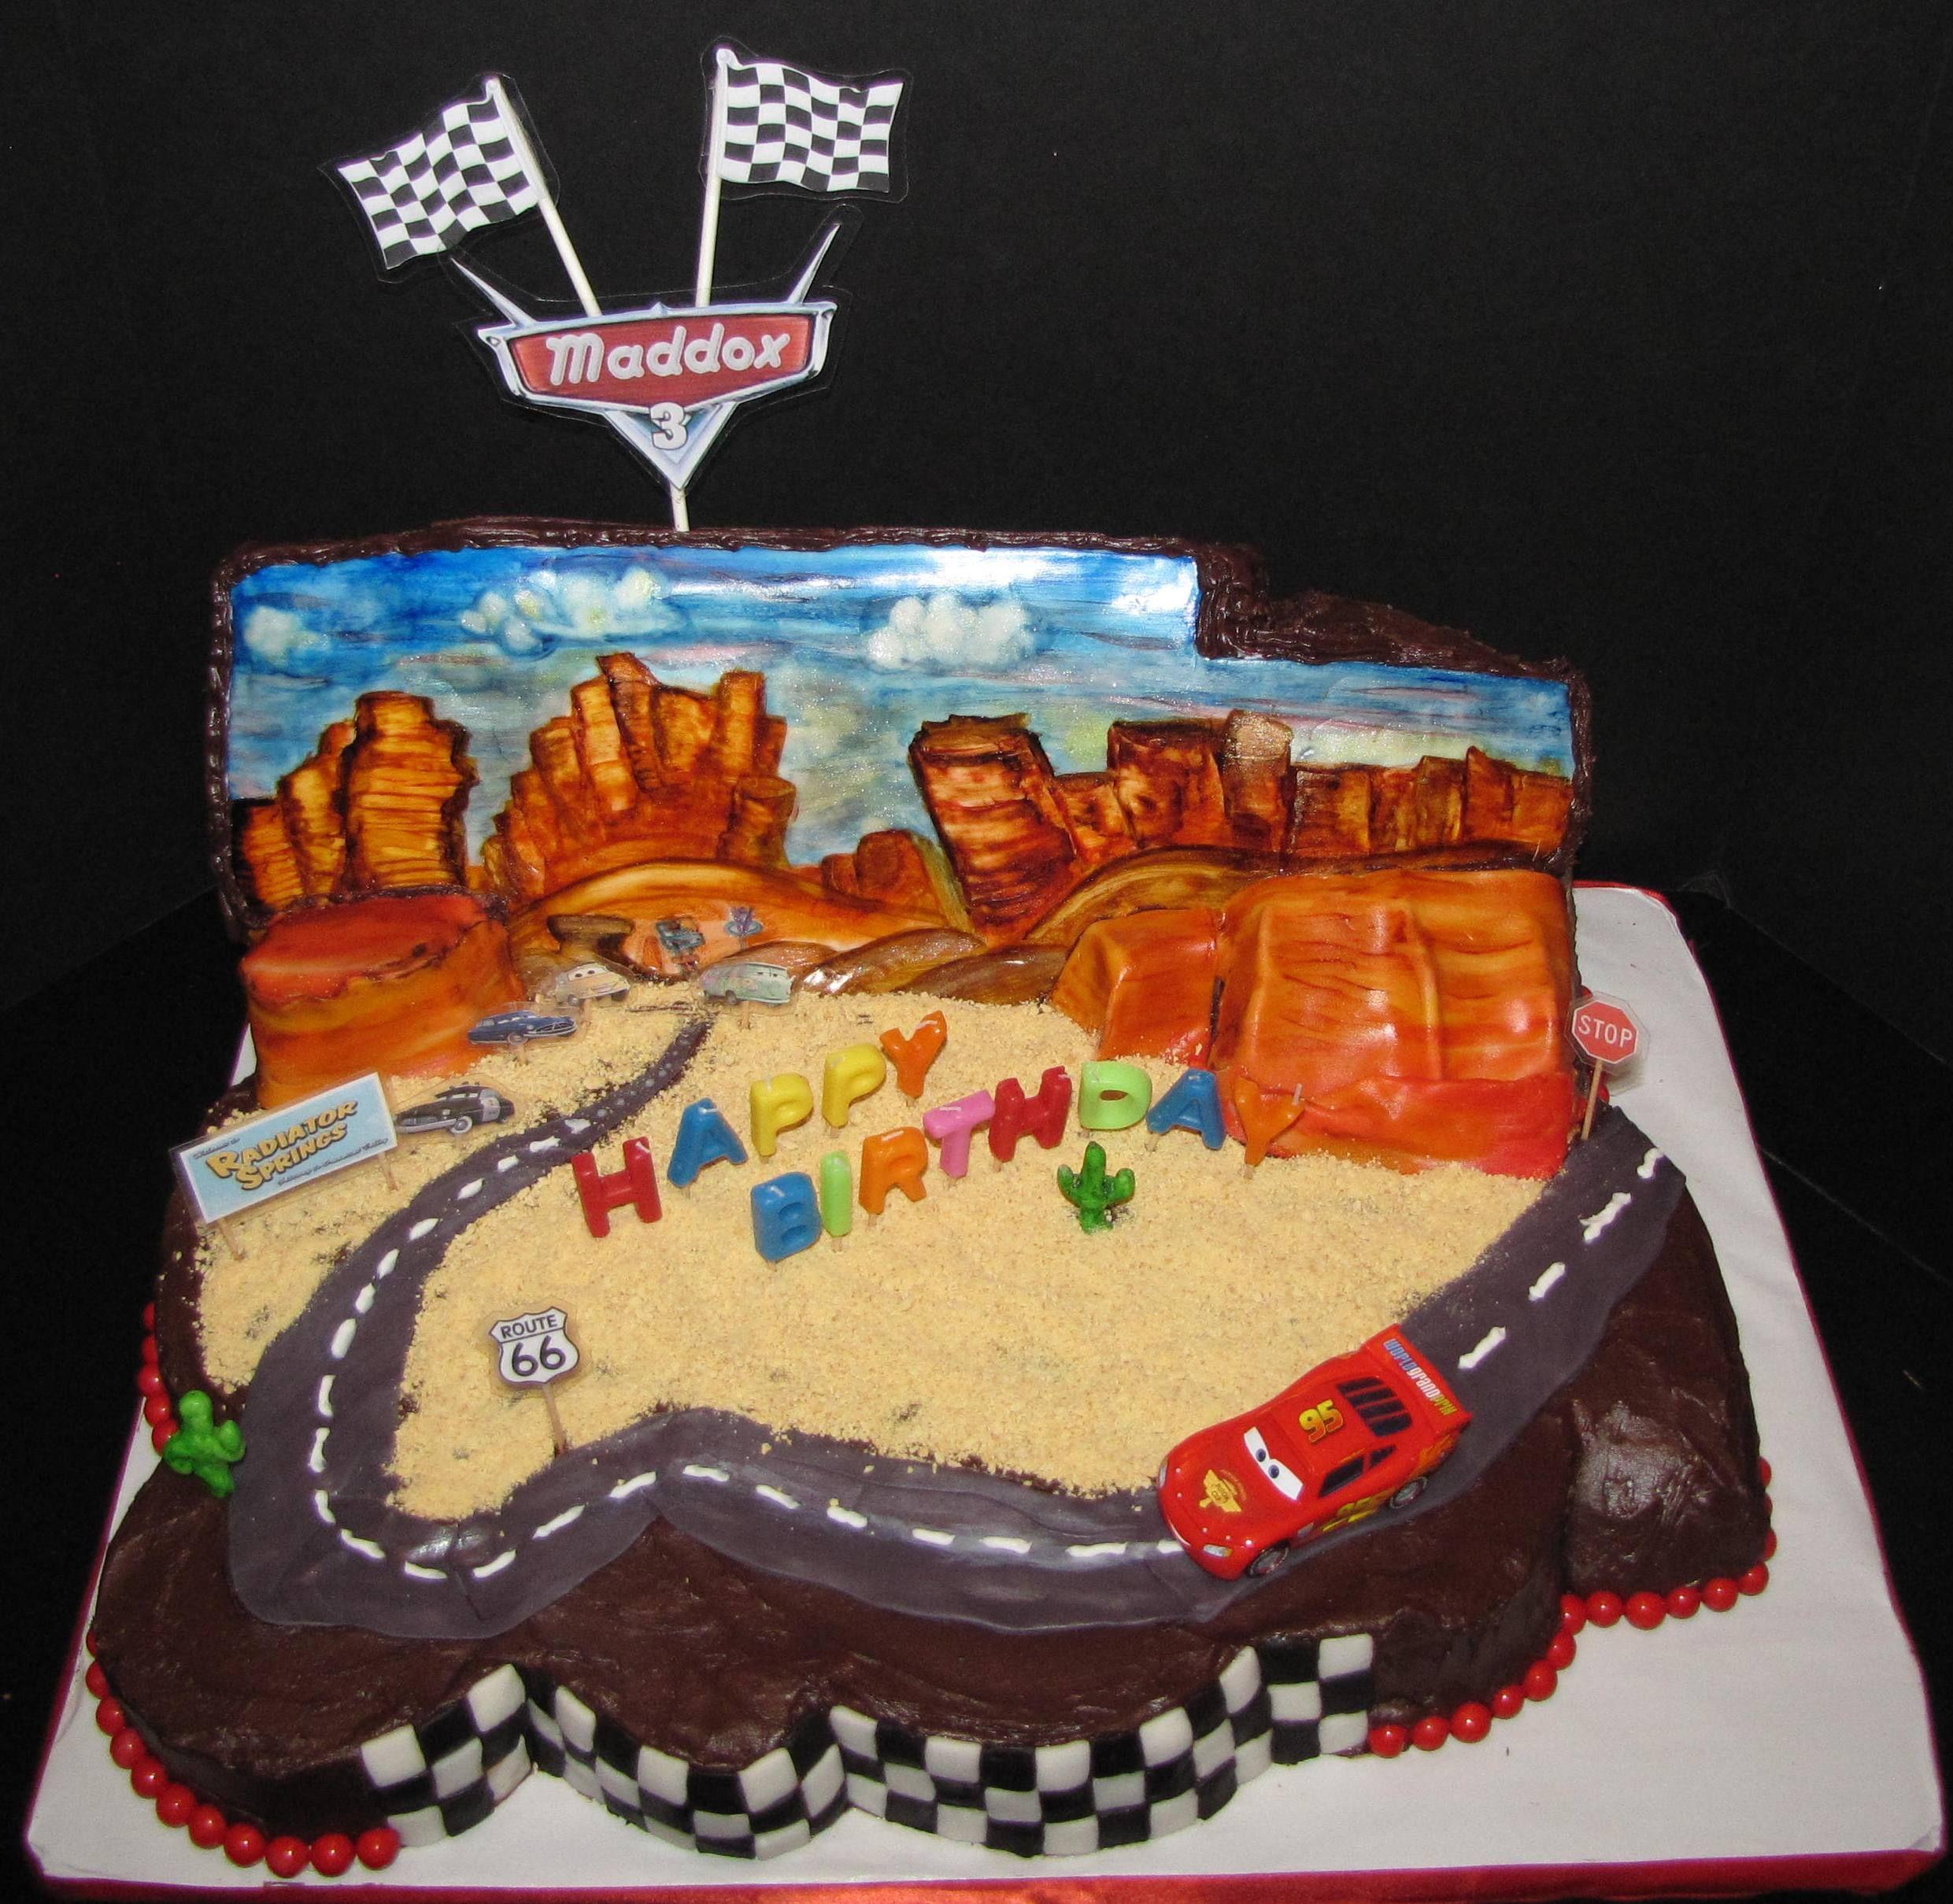 Surprising Older Boys Birthday Cakes Slubne Suknie Info Funny Birthday Cards Online Sheoxdamsfinfo